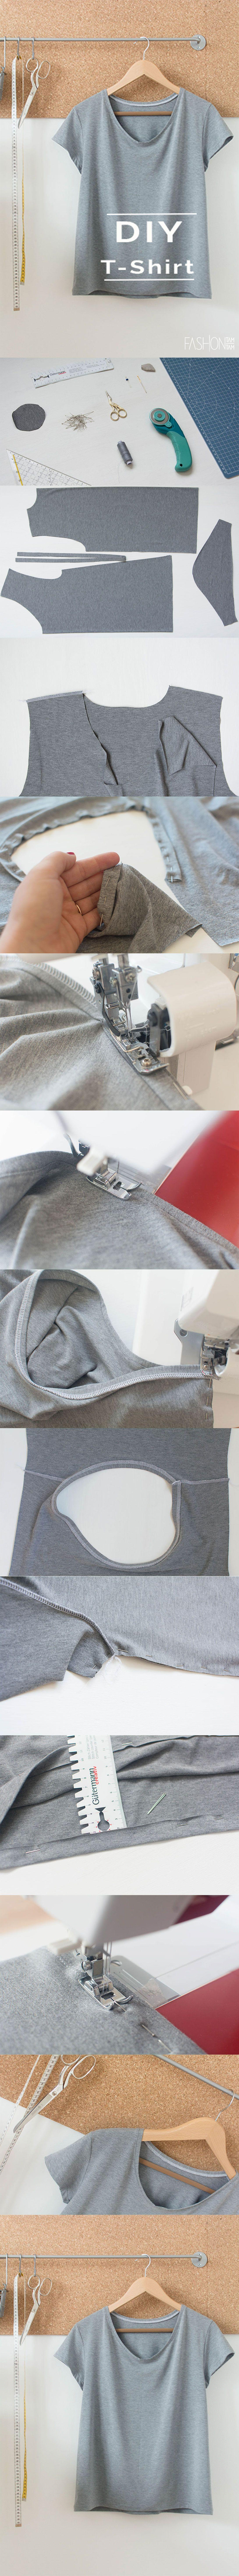 DIY FASHION ^ DIY T-SHIRT ^ SELFMADEFASHION ^ T-SHIRT NÄHEN #diyclothes